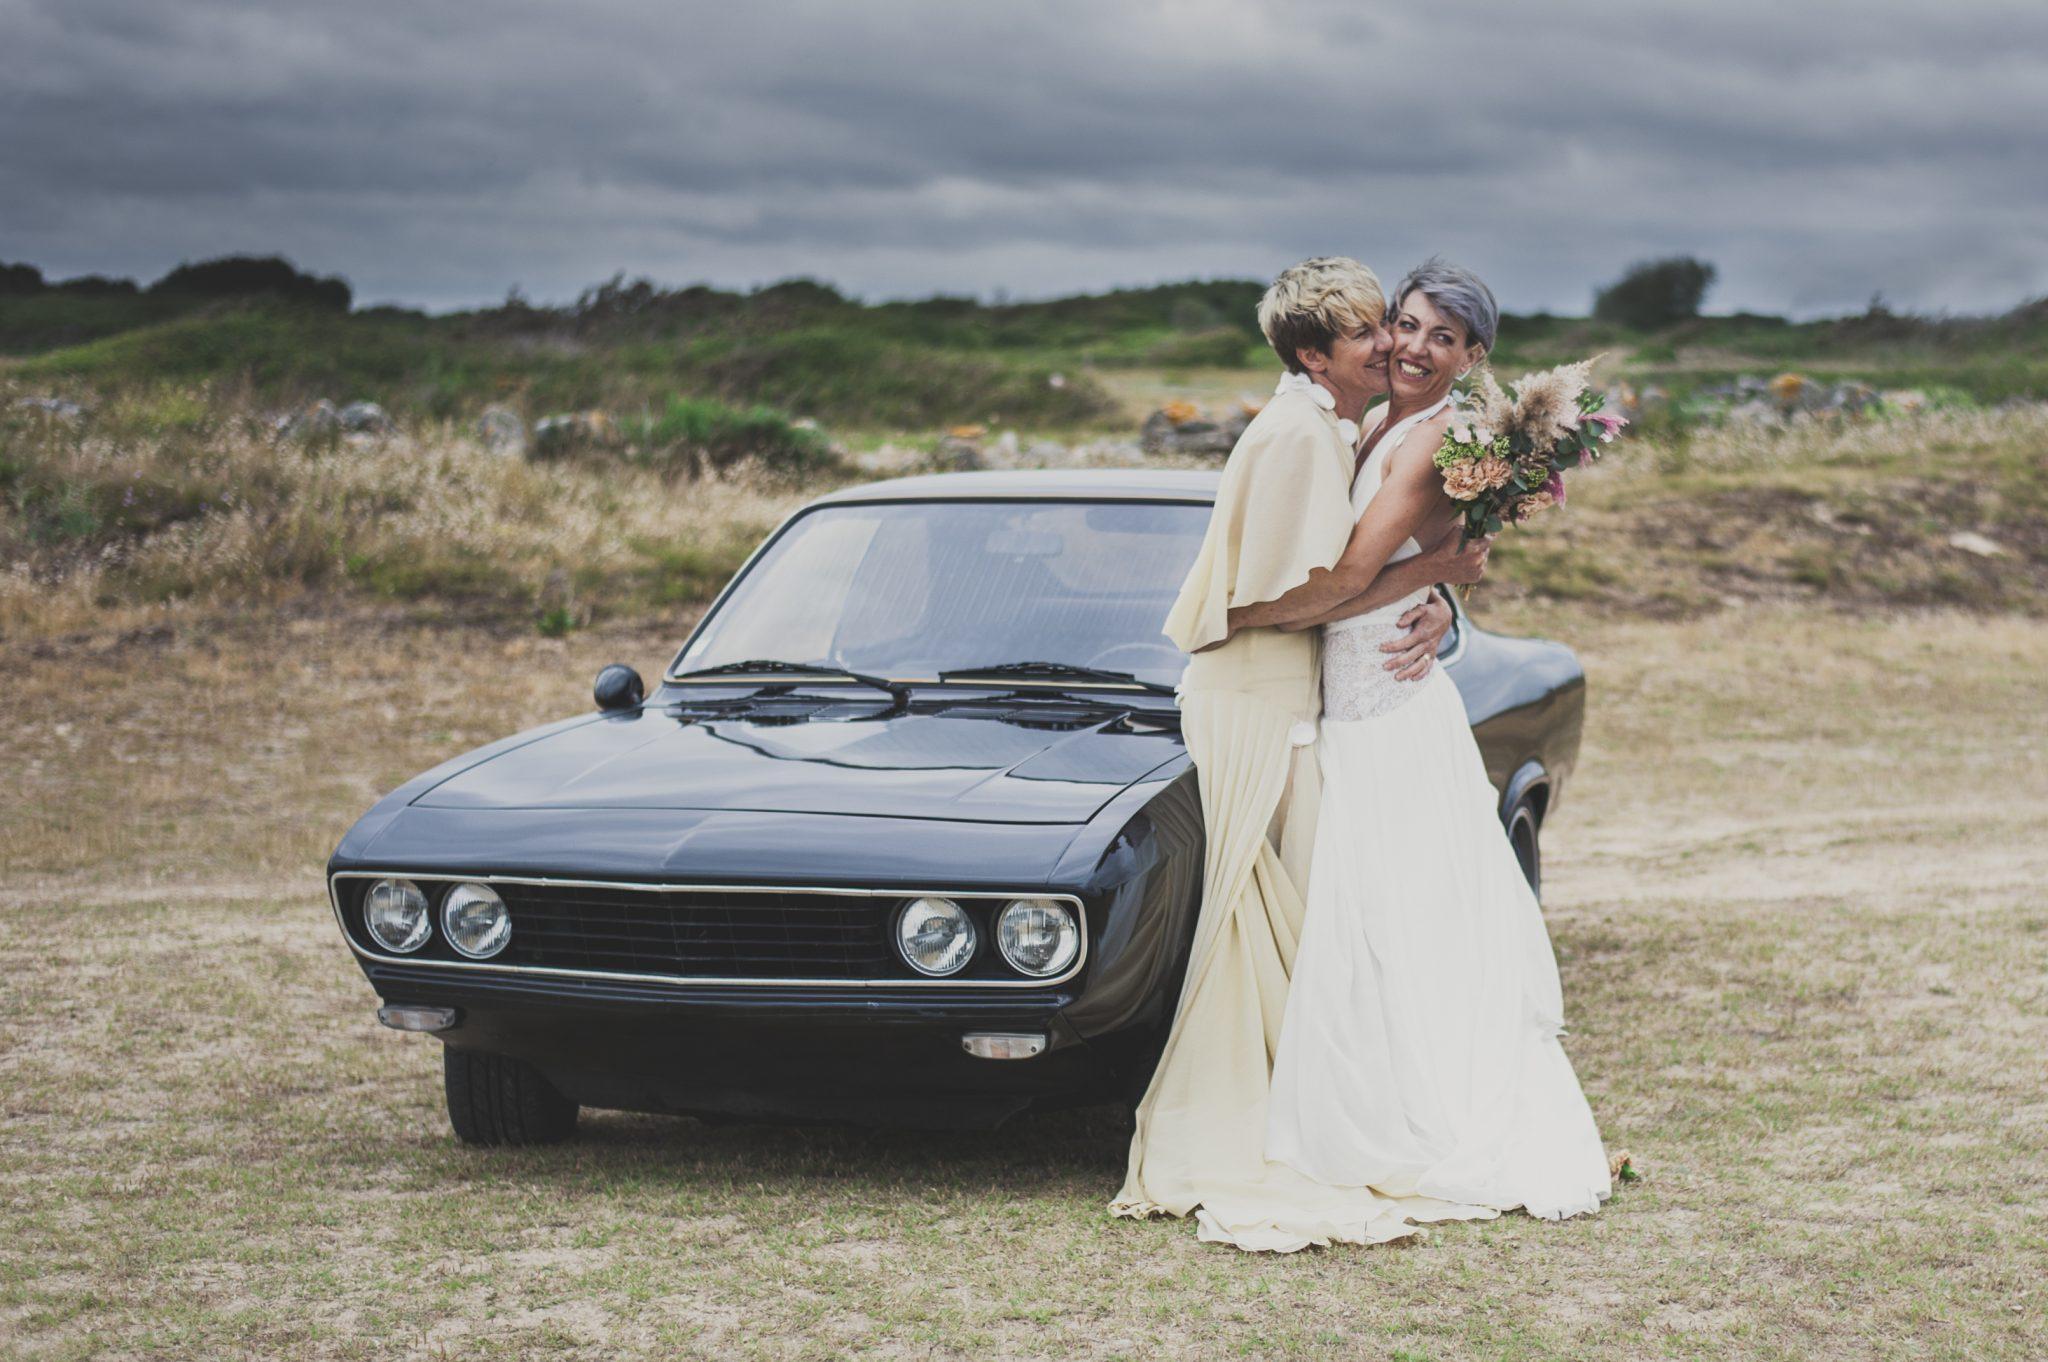 SANDRINE BONVOISIN, LGBT wedding Photographer - All Lovers' photographer